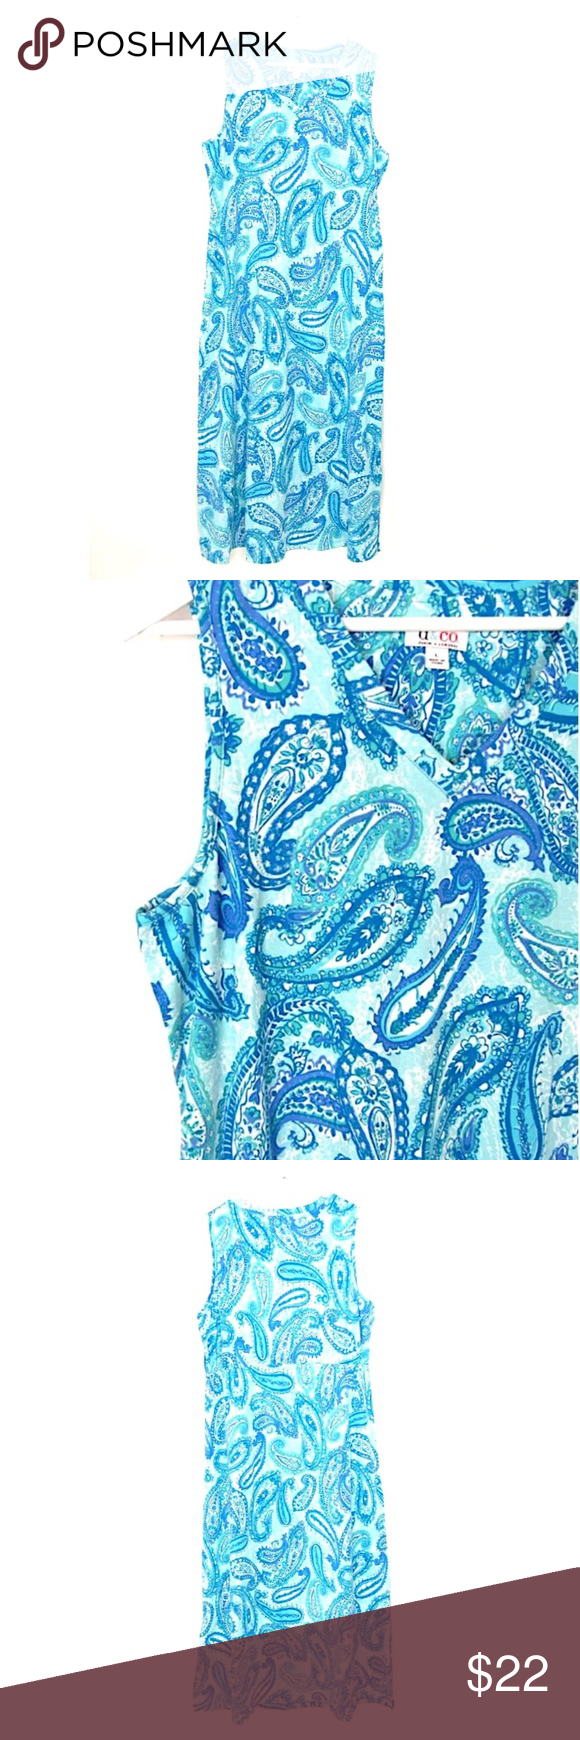 D Co Blue Paisley Knit Maxi Dress Sleeveless L Denim Co Essentials Blue Paisley Sleeveless Maxi Dress Sz L Knit Long V Maxi Knit Dress Blue Paisley Paisley [ 1740 x 580 Pixel ]